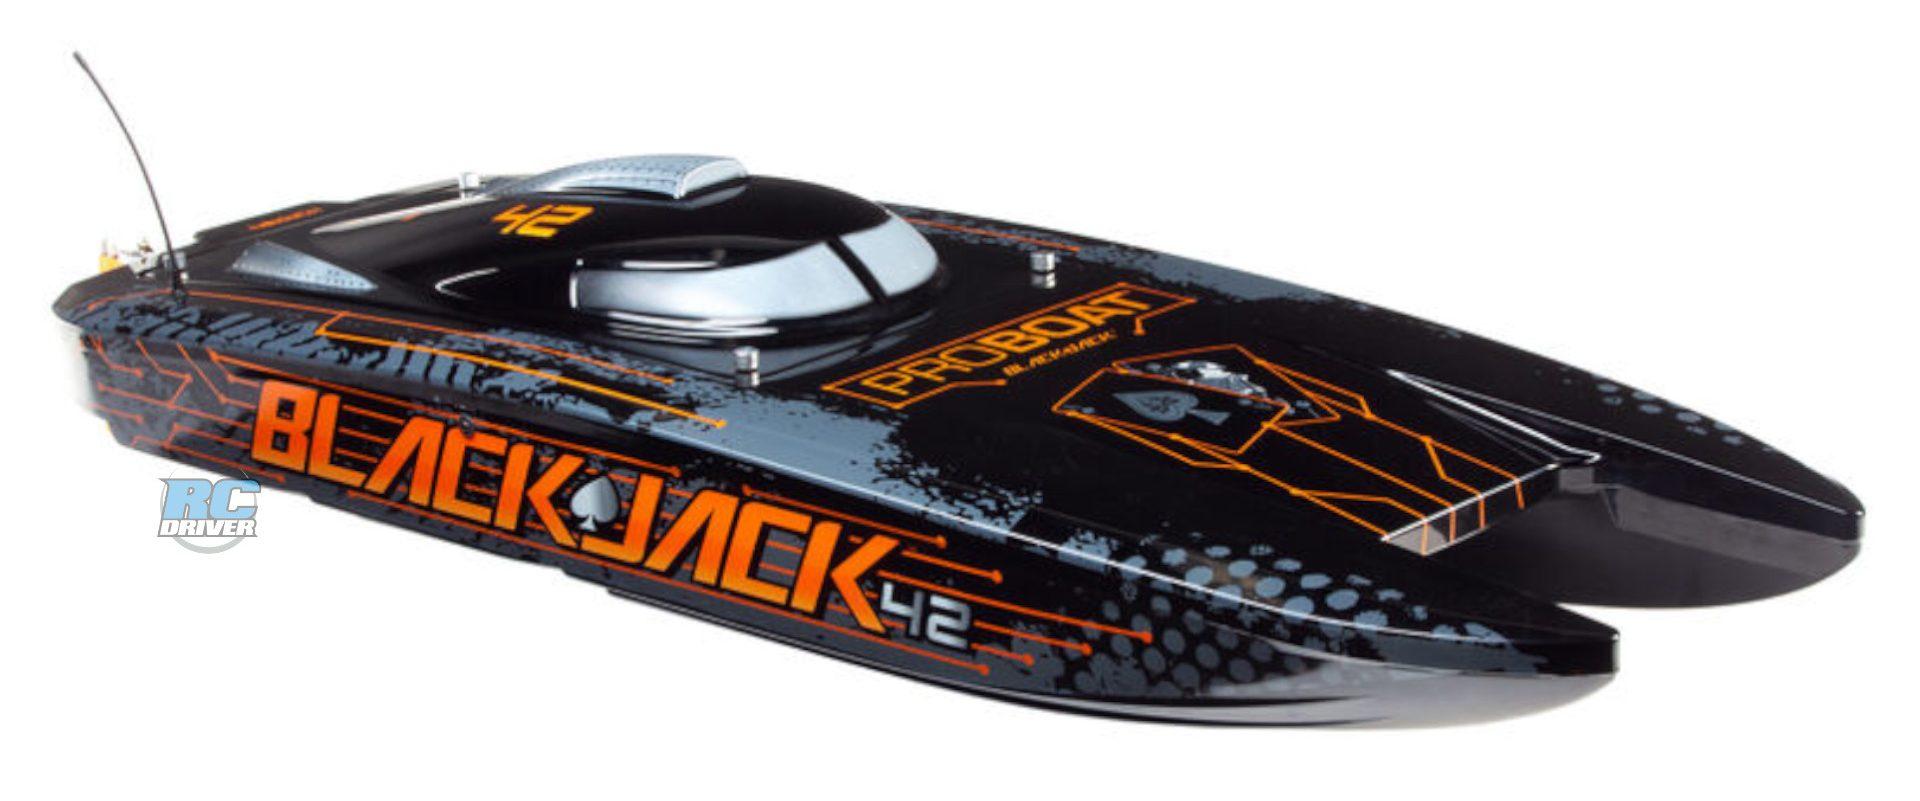 "Pro Boat Blackjack 42"" 8S Brushless Catamaran Ready-To-Run"